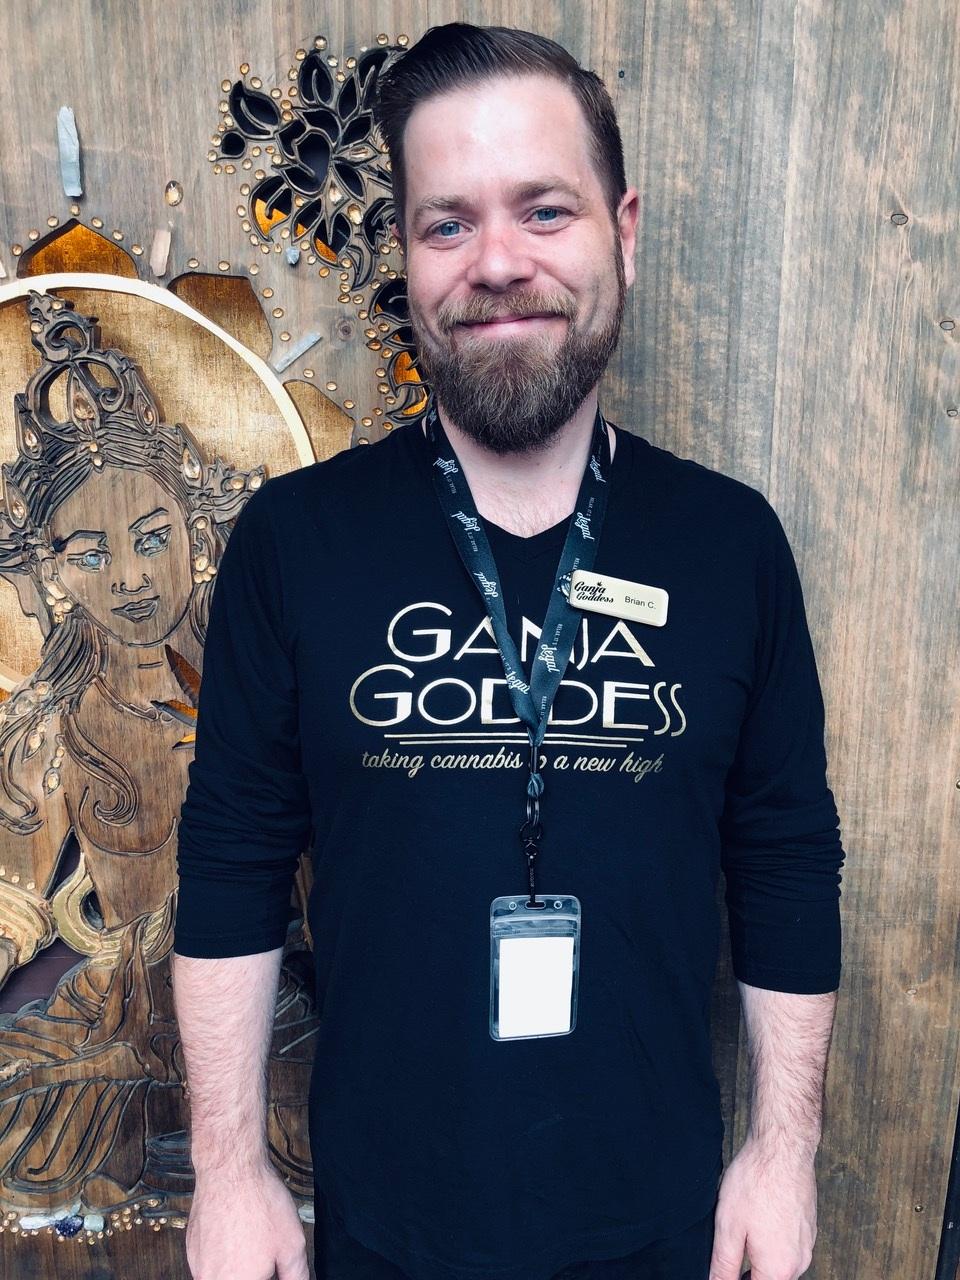 Budtender Brian Ganja Goddess Seattle